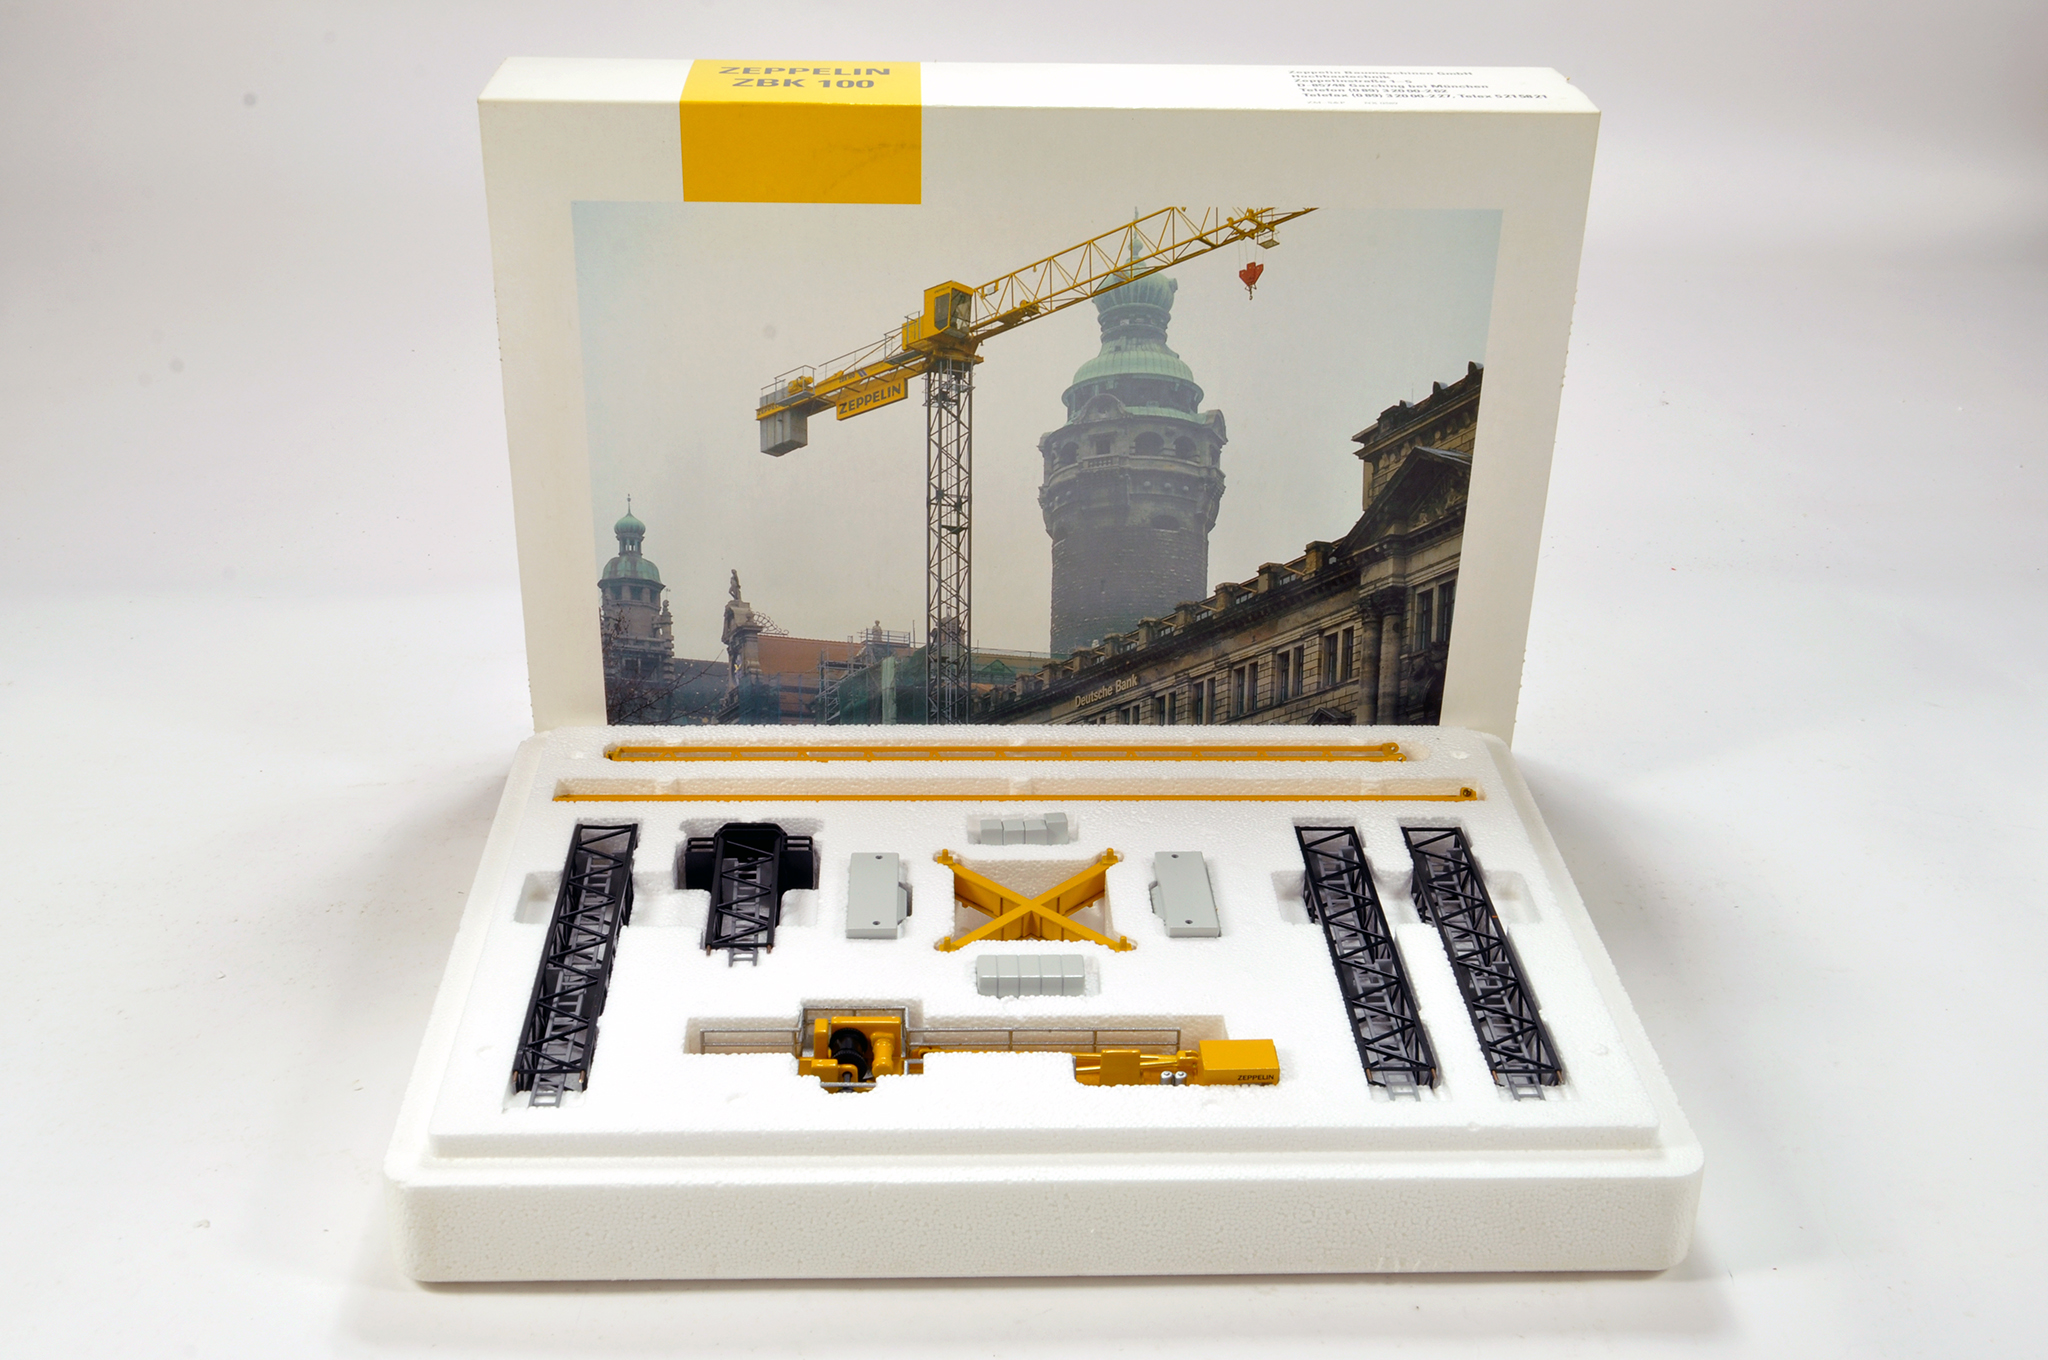 Lot 337 - Conrad 1/87 construction issue comprising Zepplin ZBK 100 Tower Crane. E to NM.